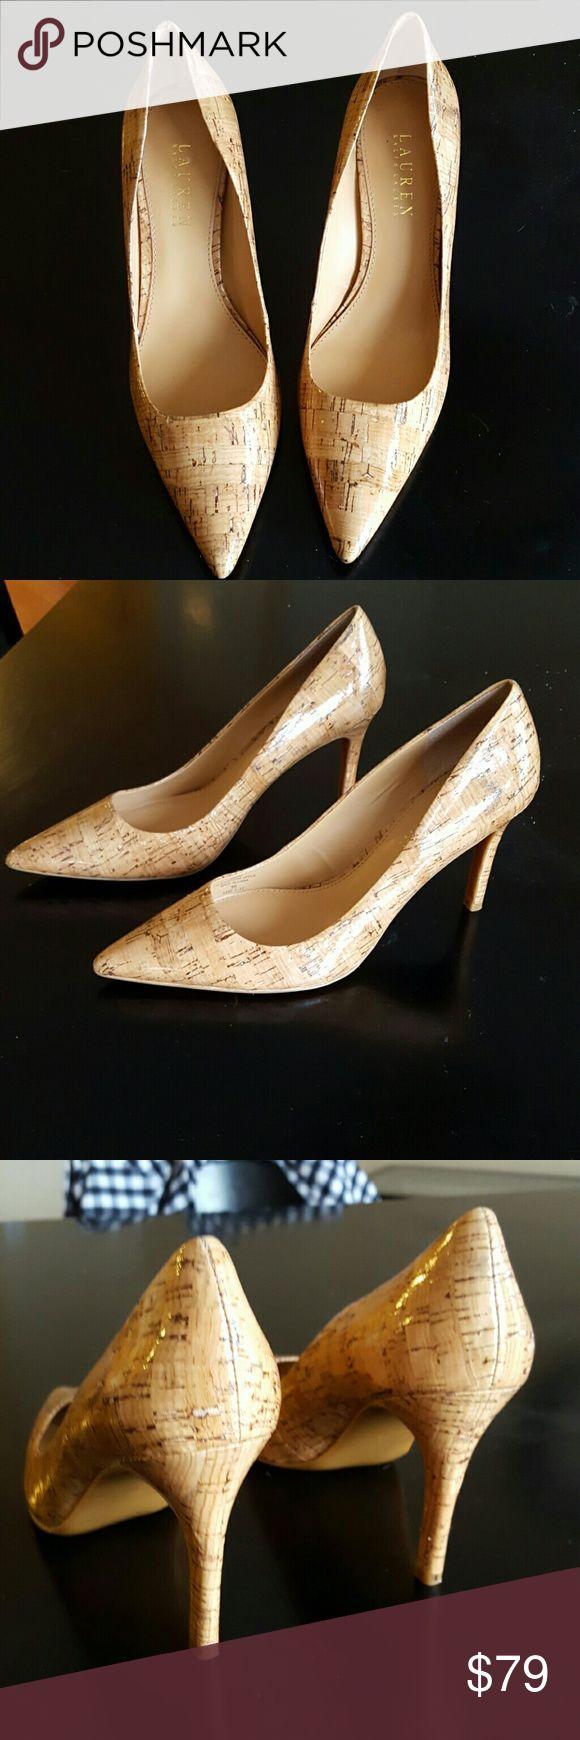 Lauren by RALPH LAUREN Heels. Size 9 Patent leather. Pointed toes. 4 in. Faux cork design. Worn once.  Beautiful. Ralph Lauren Shoes Heels